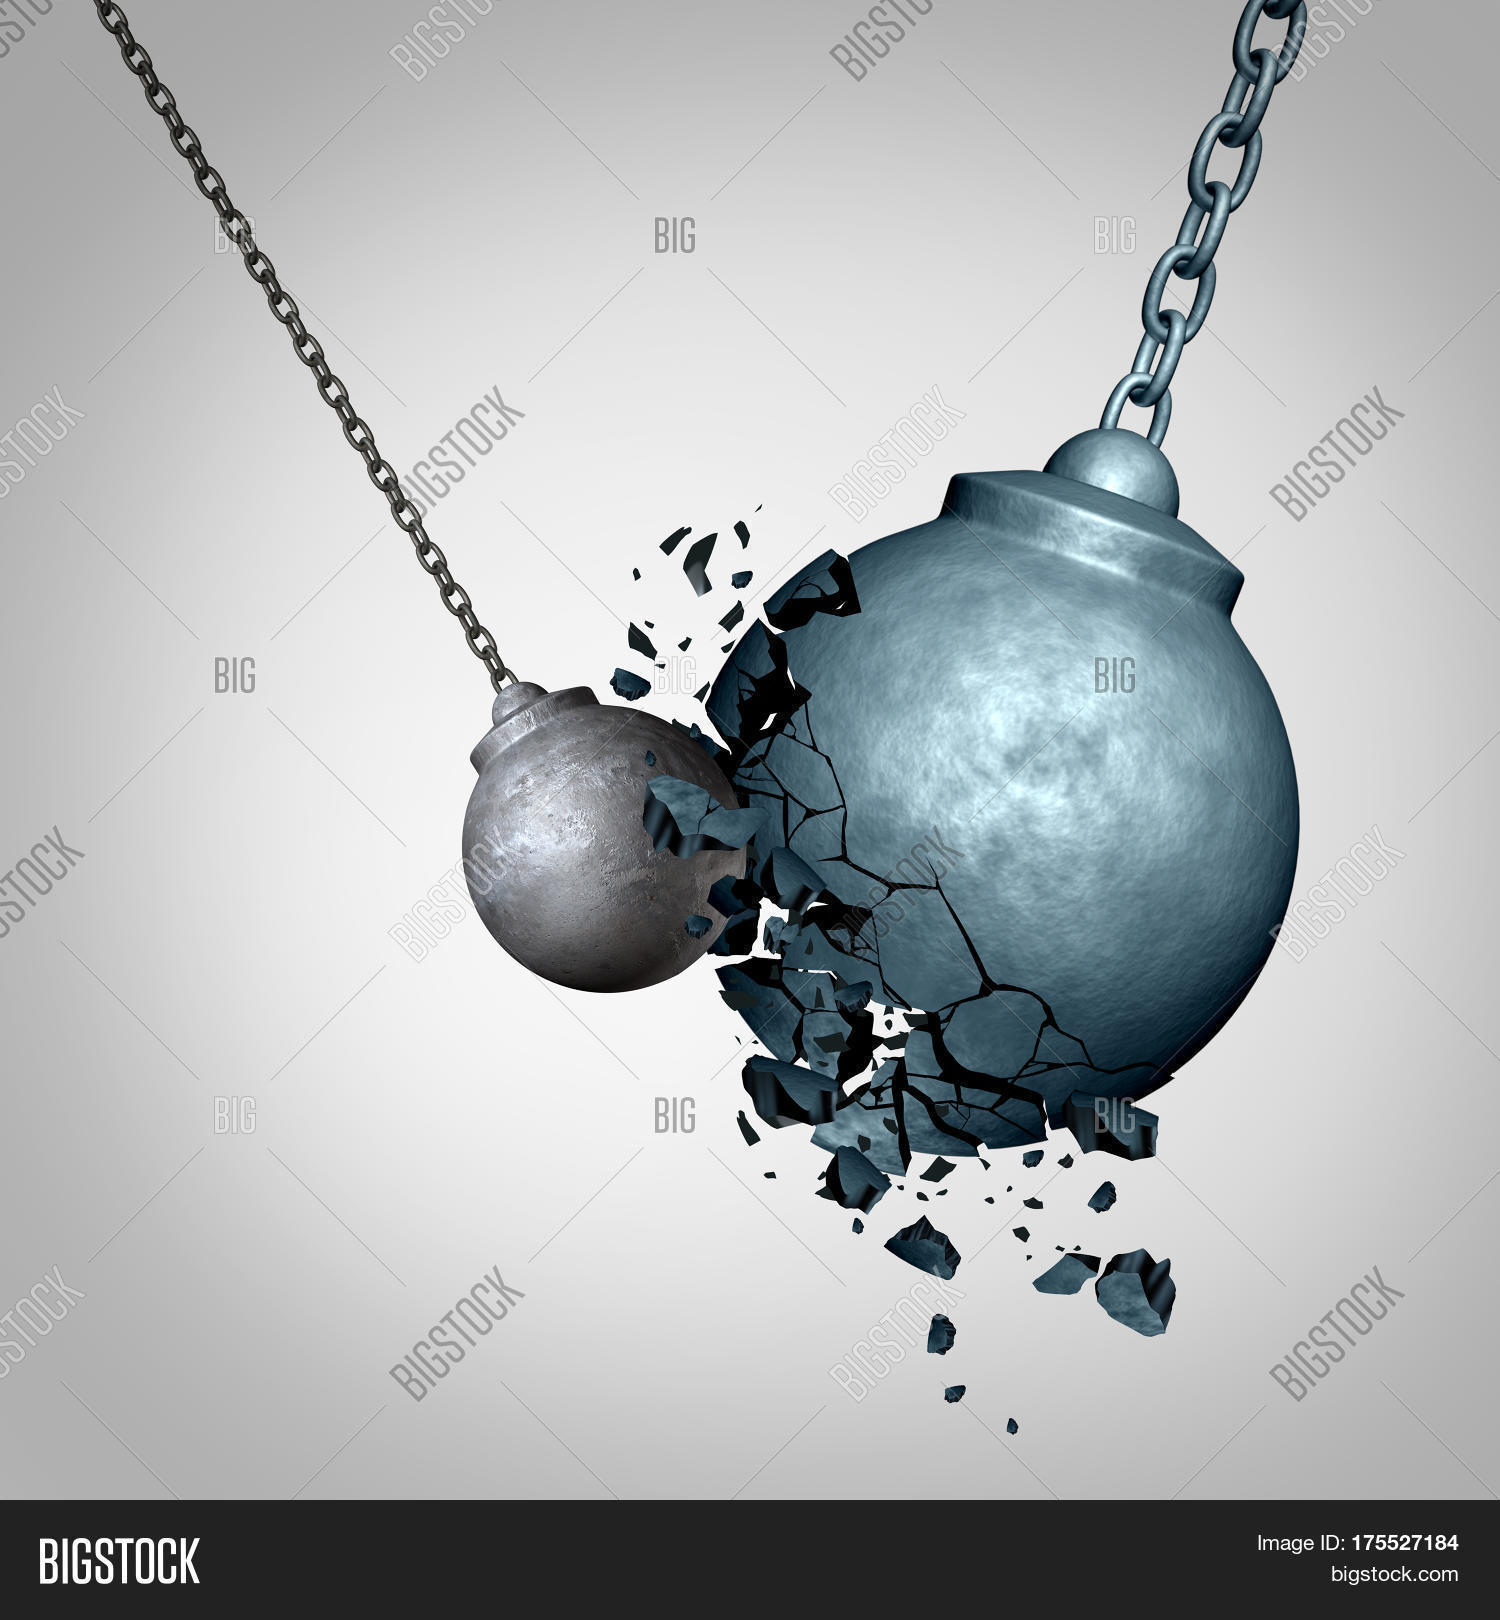 Small Business Winning Image Photo Free Trial Bigstock